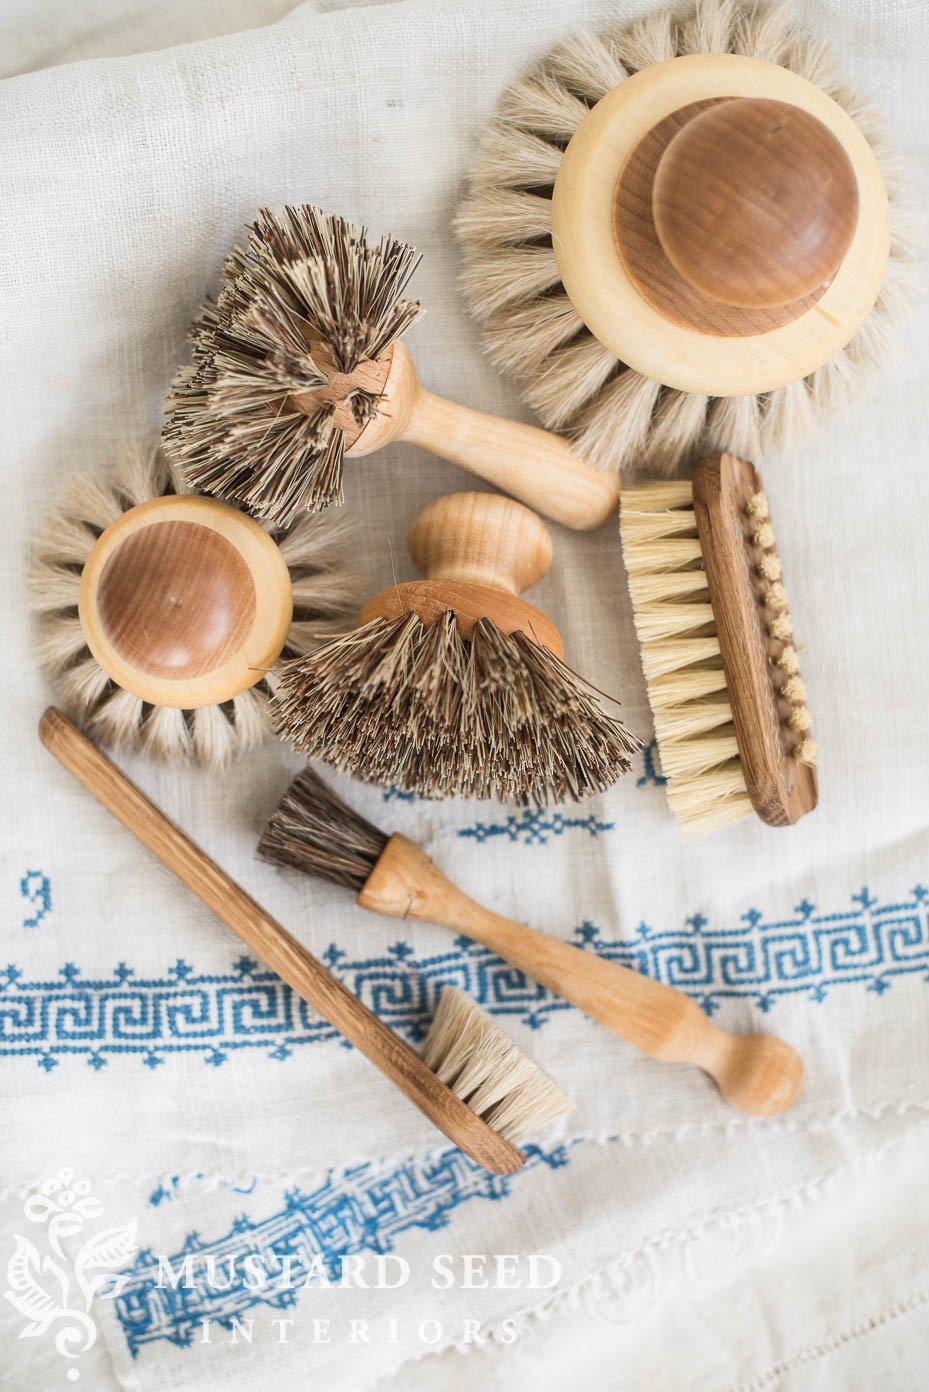 iris hantverk brushes | dreamy whites | miss mustard seed